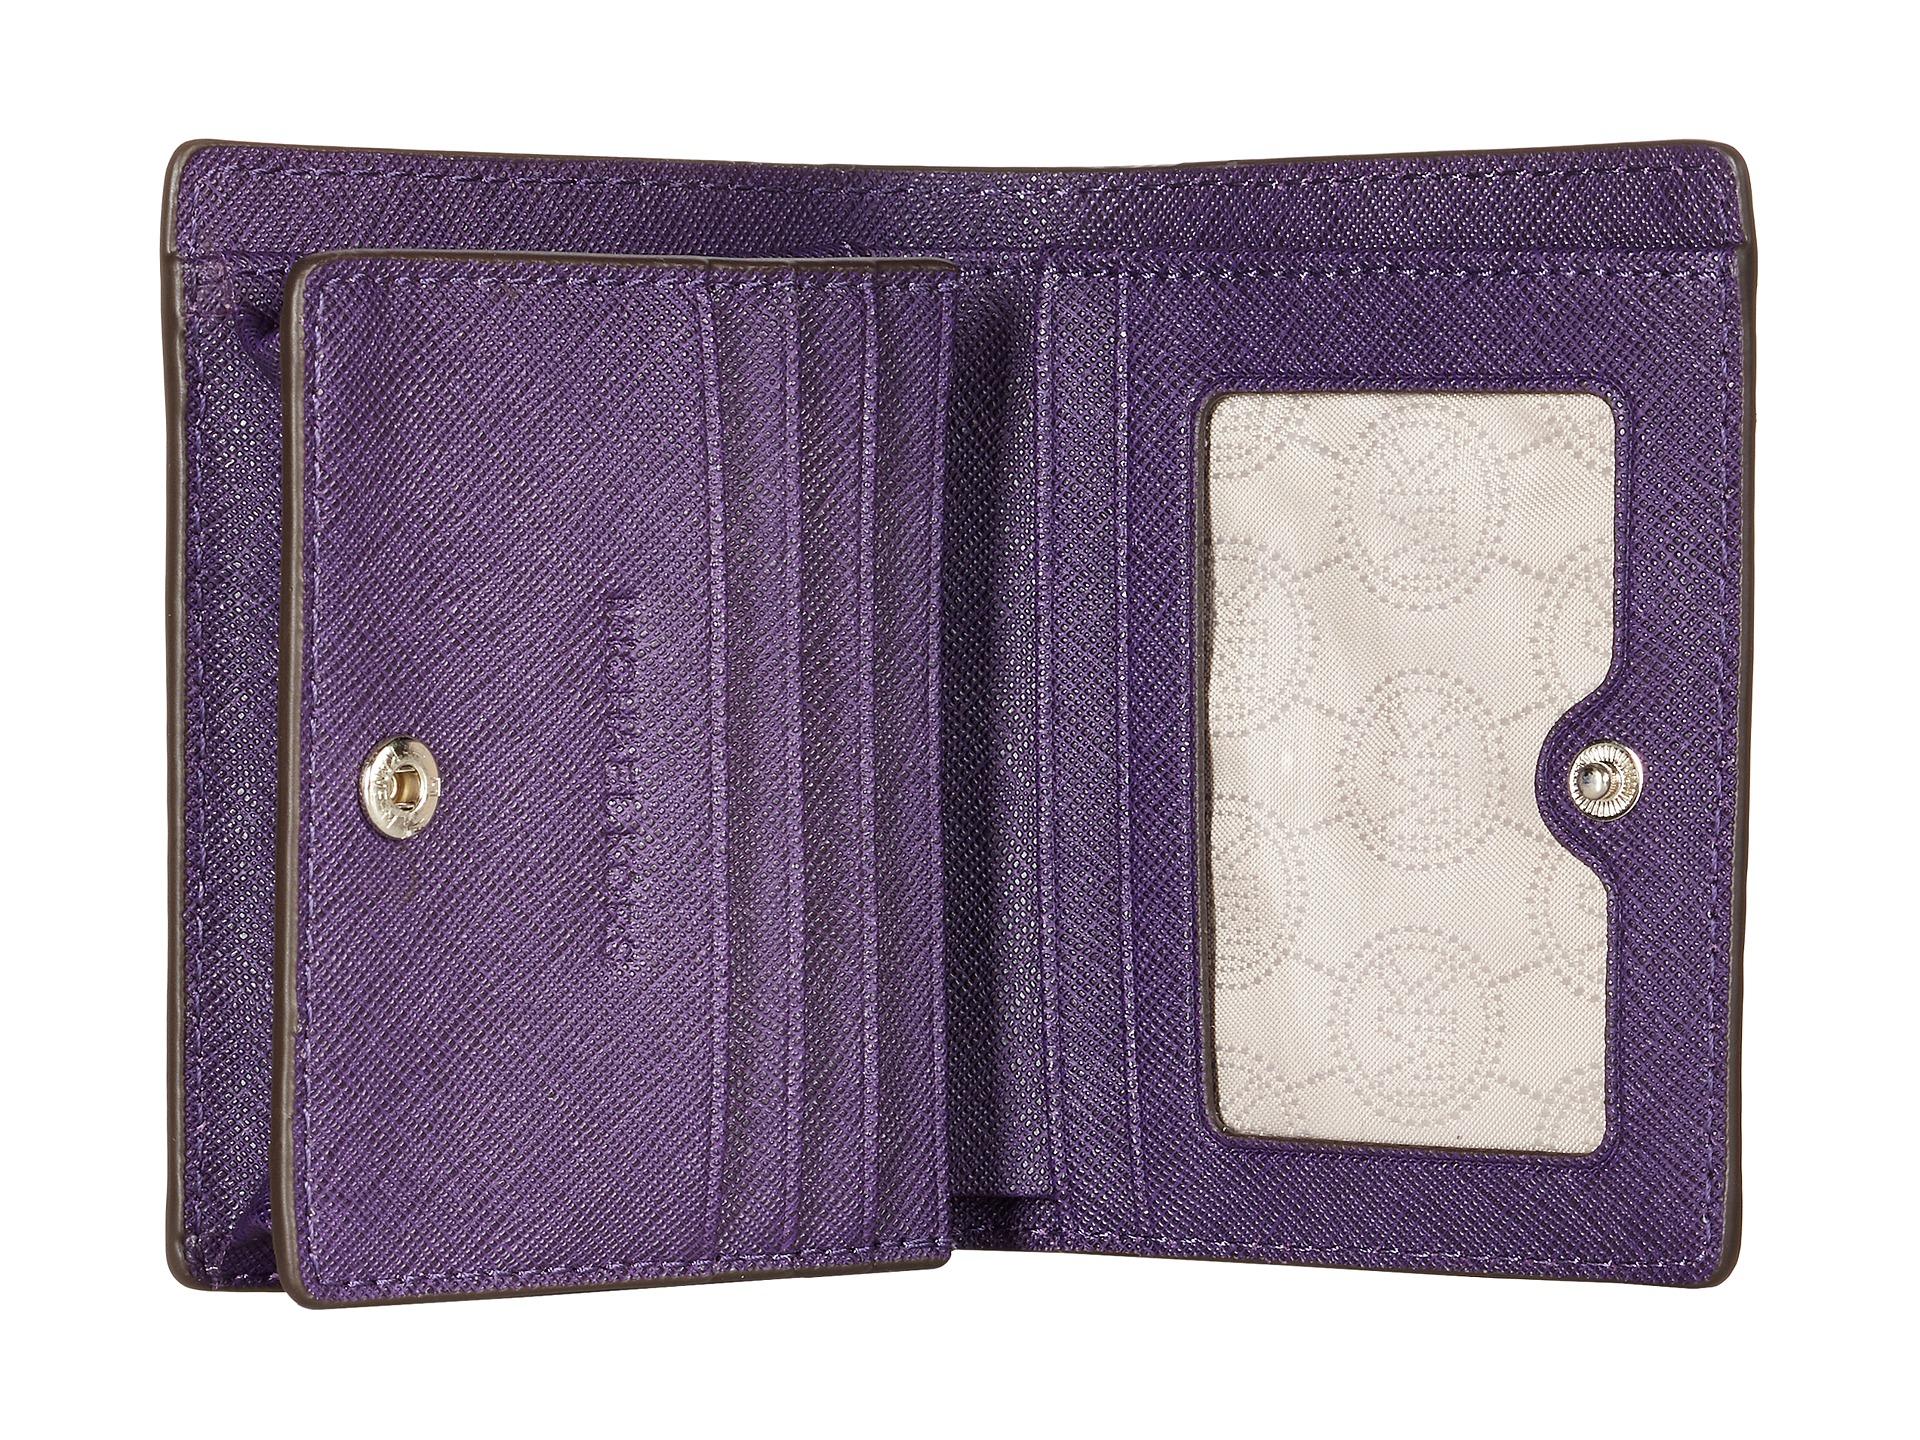 4c75ffb8a2fec9 MICHAEL Michael Kors Jet Set Travel Flap Card Holder in Purple - Lyst